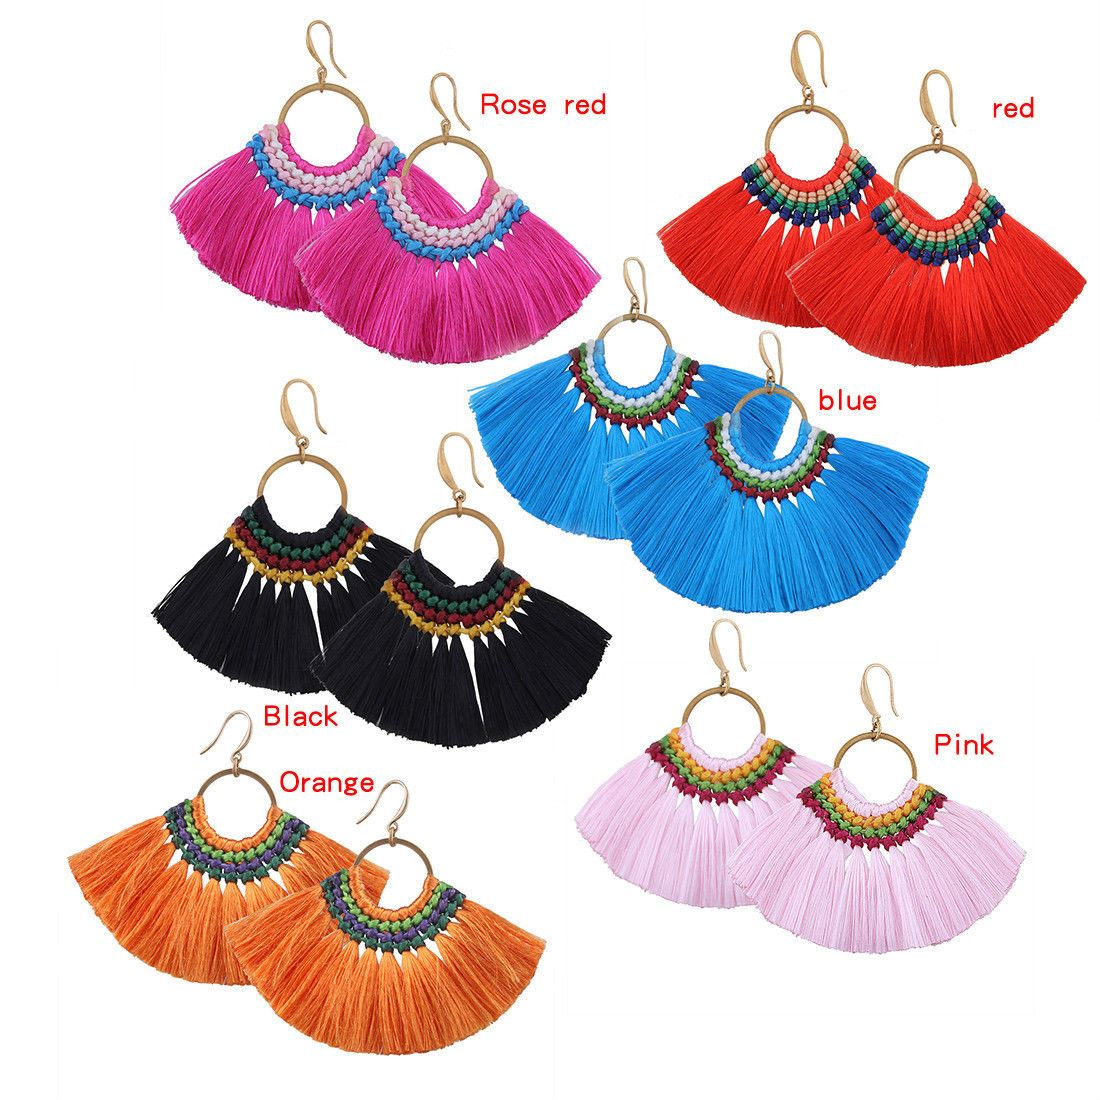 Women-Fashion-Rhinestone-Long-Tassel-Dangle-Earrings-Fringe-Drop-Jewelry-Gift-UK thumbnail 93